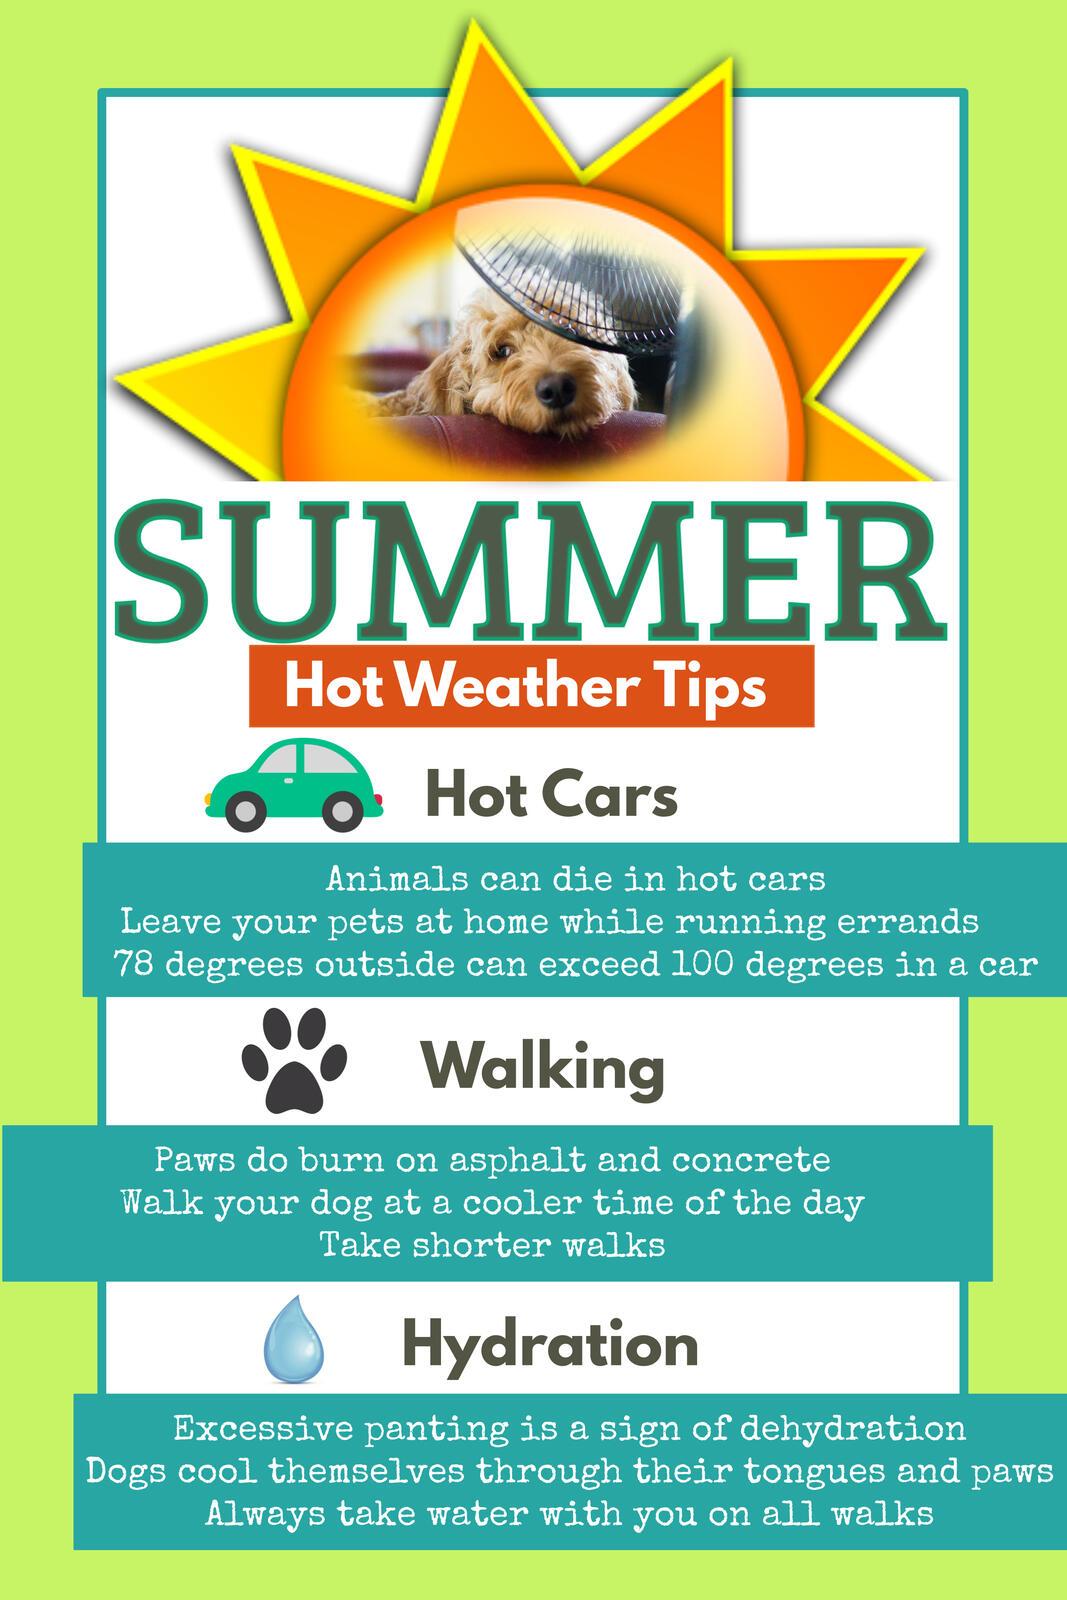 Summer Safety Tips (Pasadena Police Department) &mdash